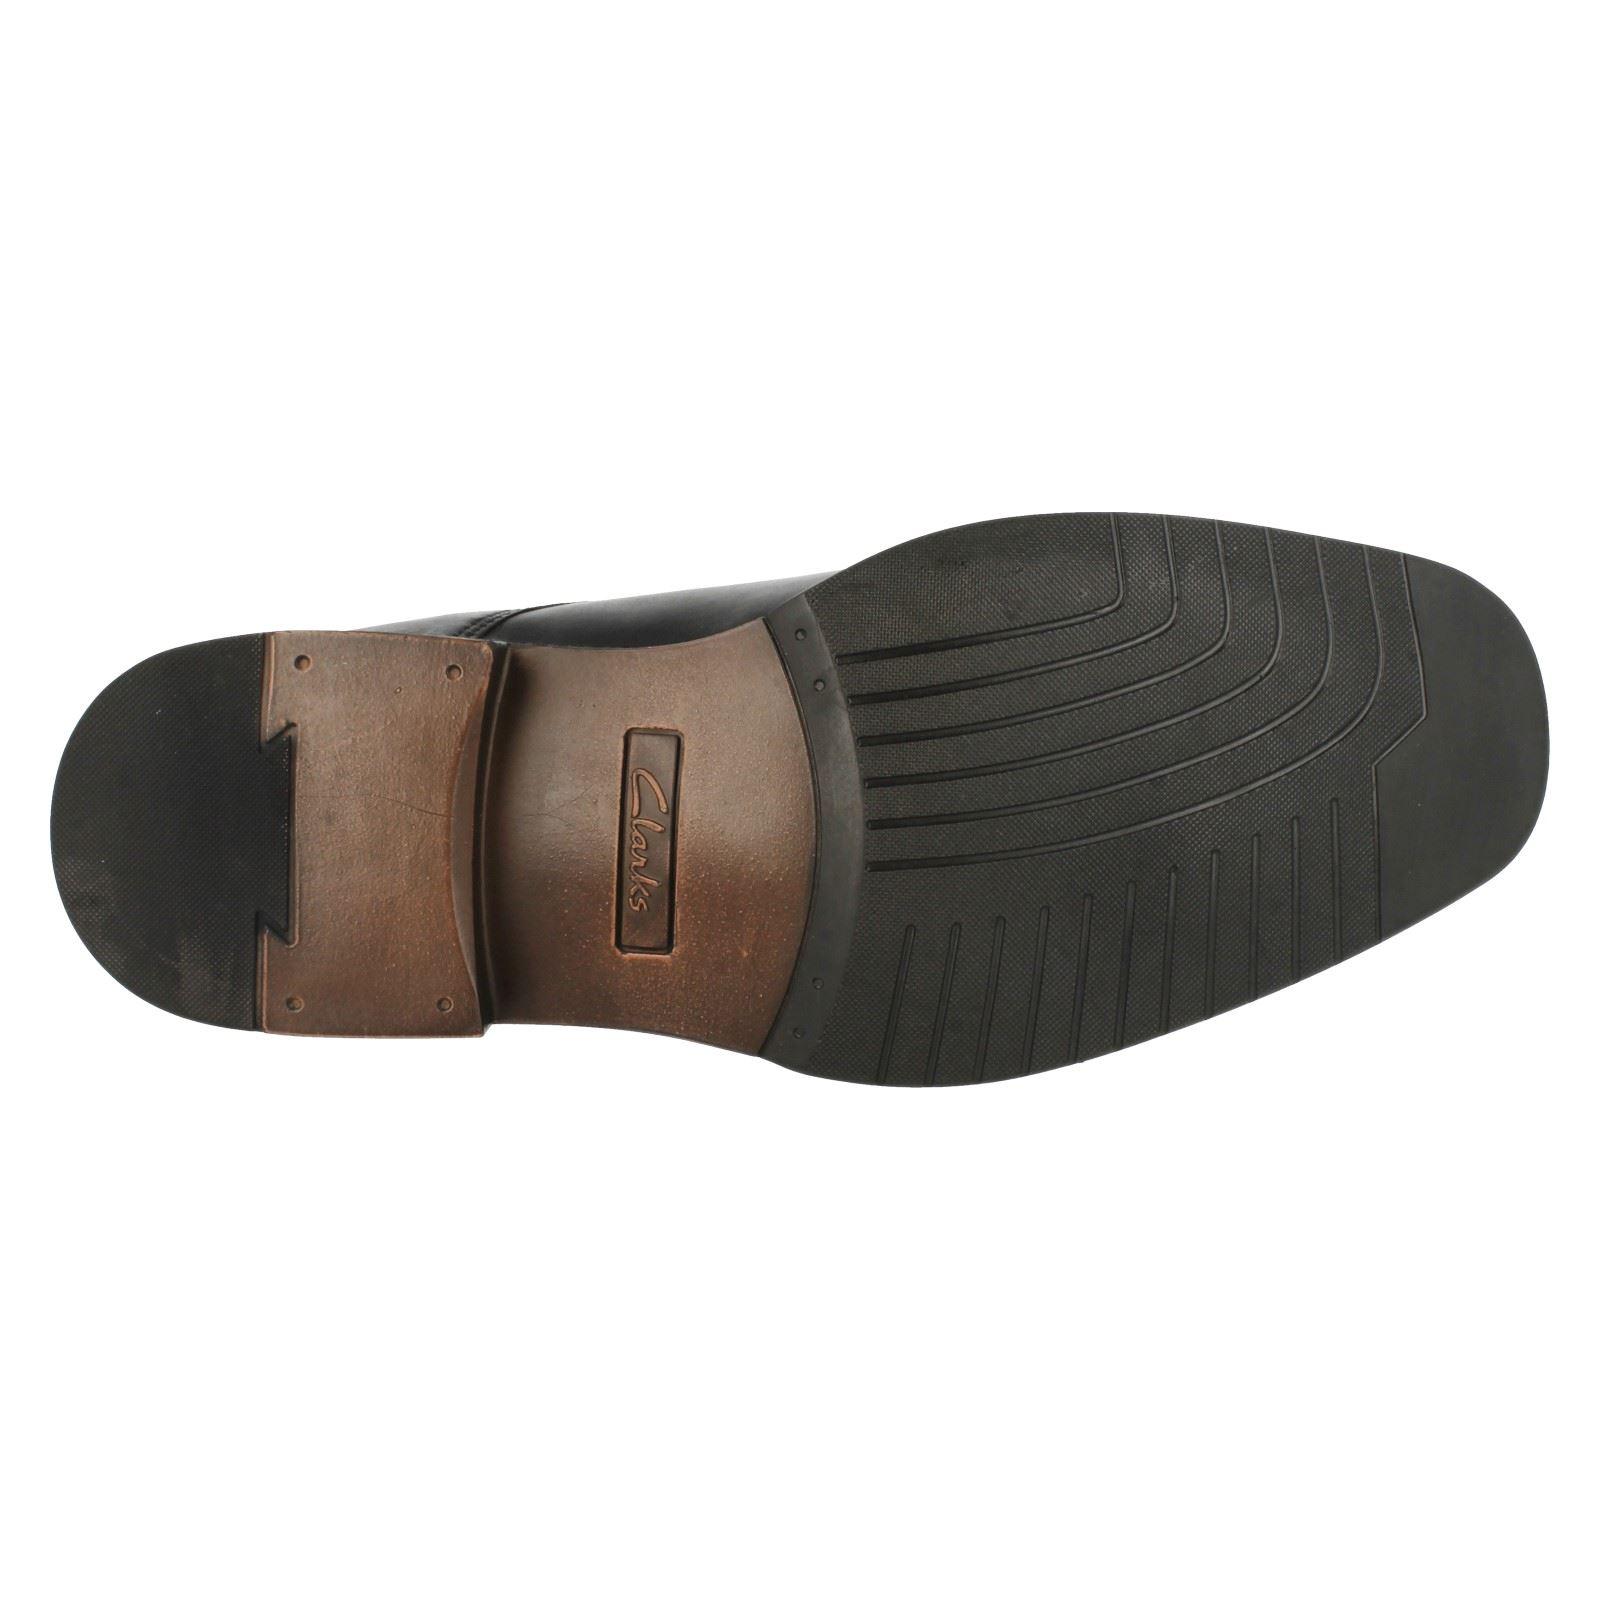 'Mens Clarks Lace' Up Shoes - Driggs Cap